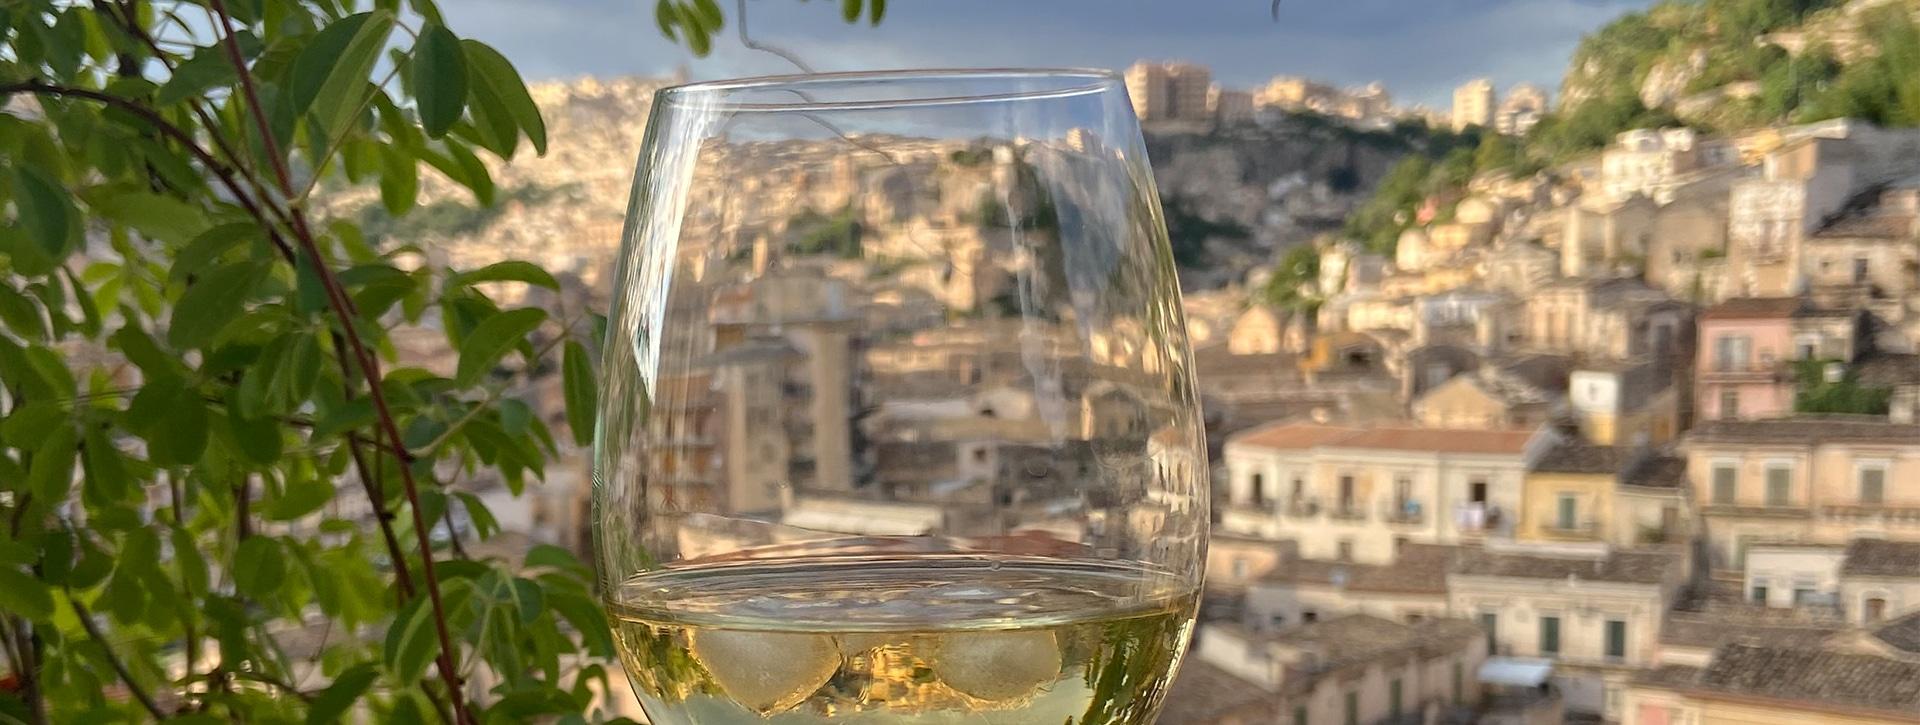 Why Do I Love Sicily?